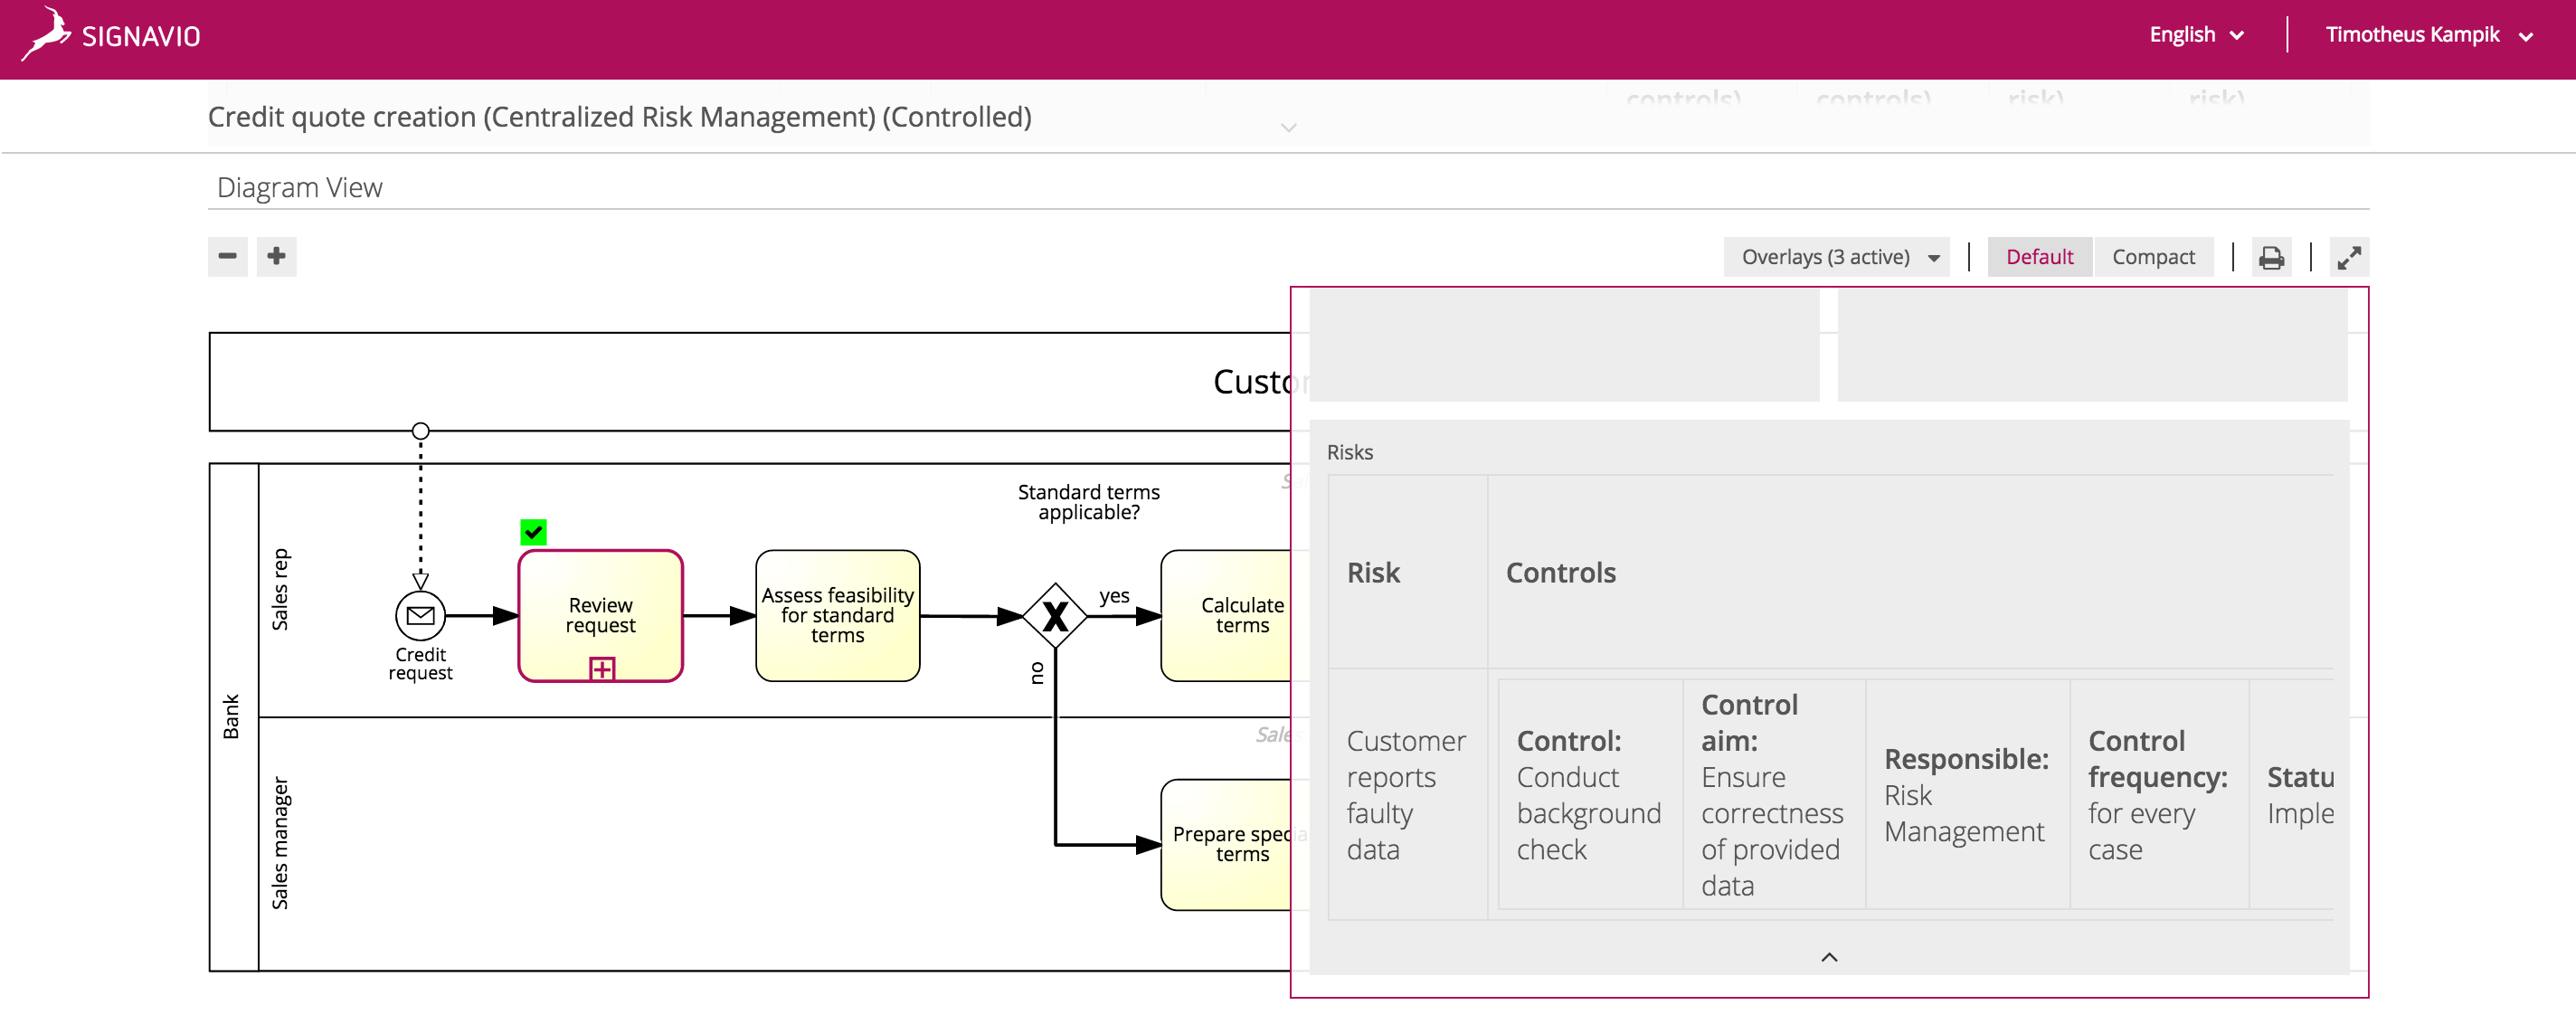 Add control to risk screen